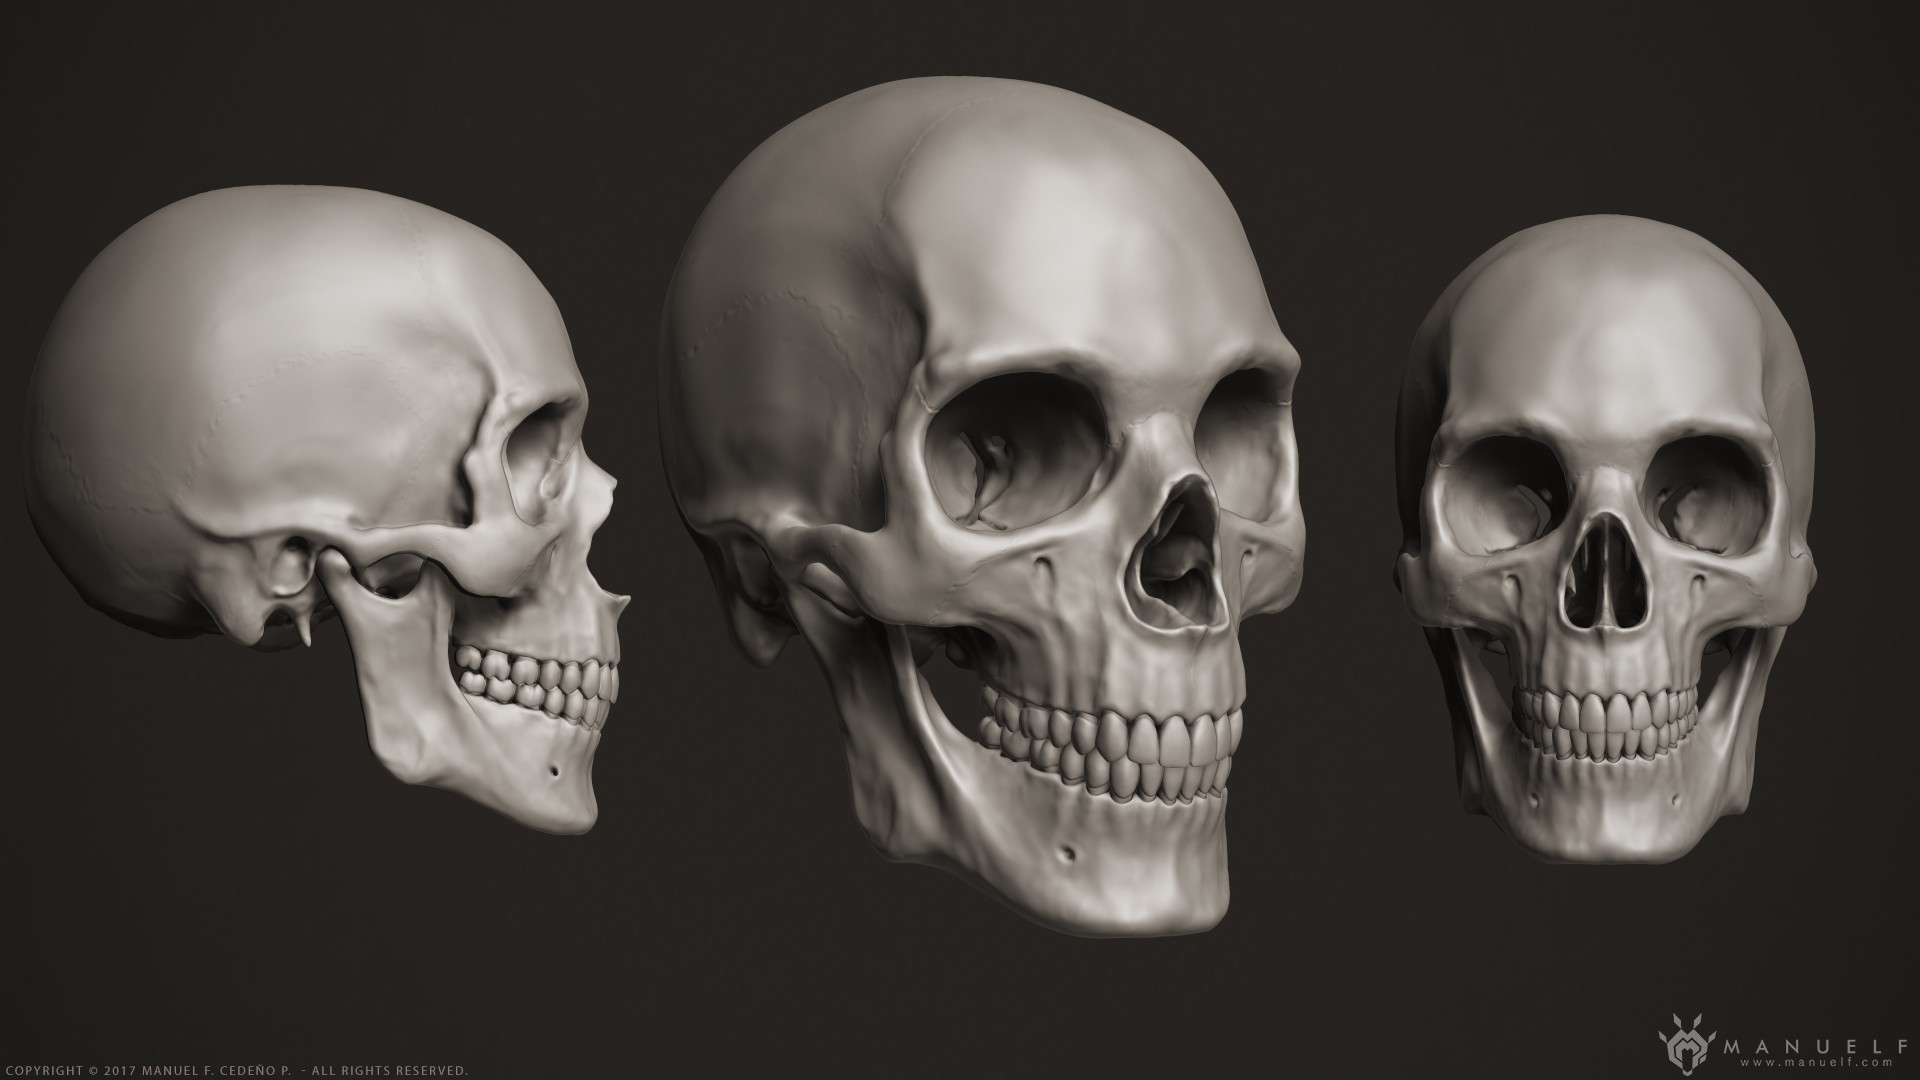 ArtStation - 3D Human Skeleton, Manuel F  Cedeño